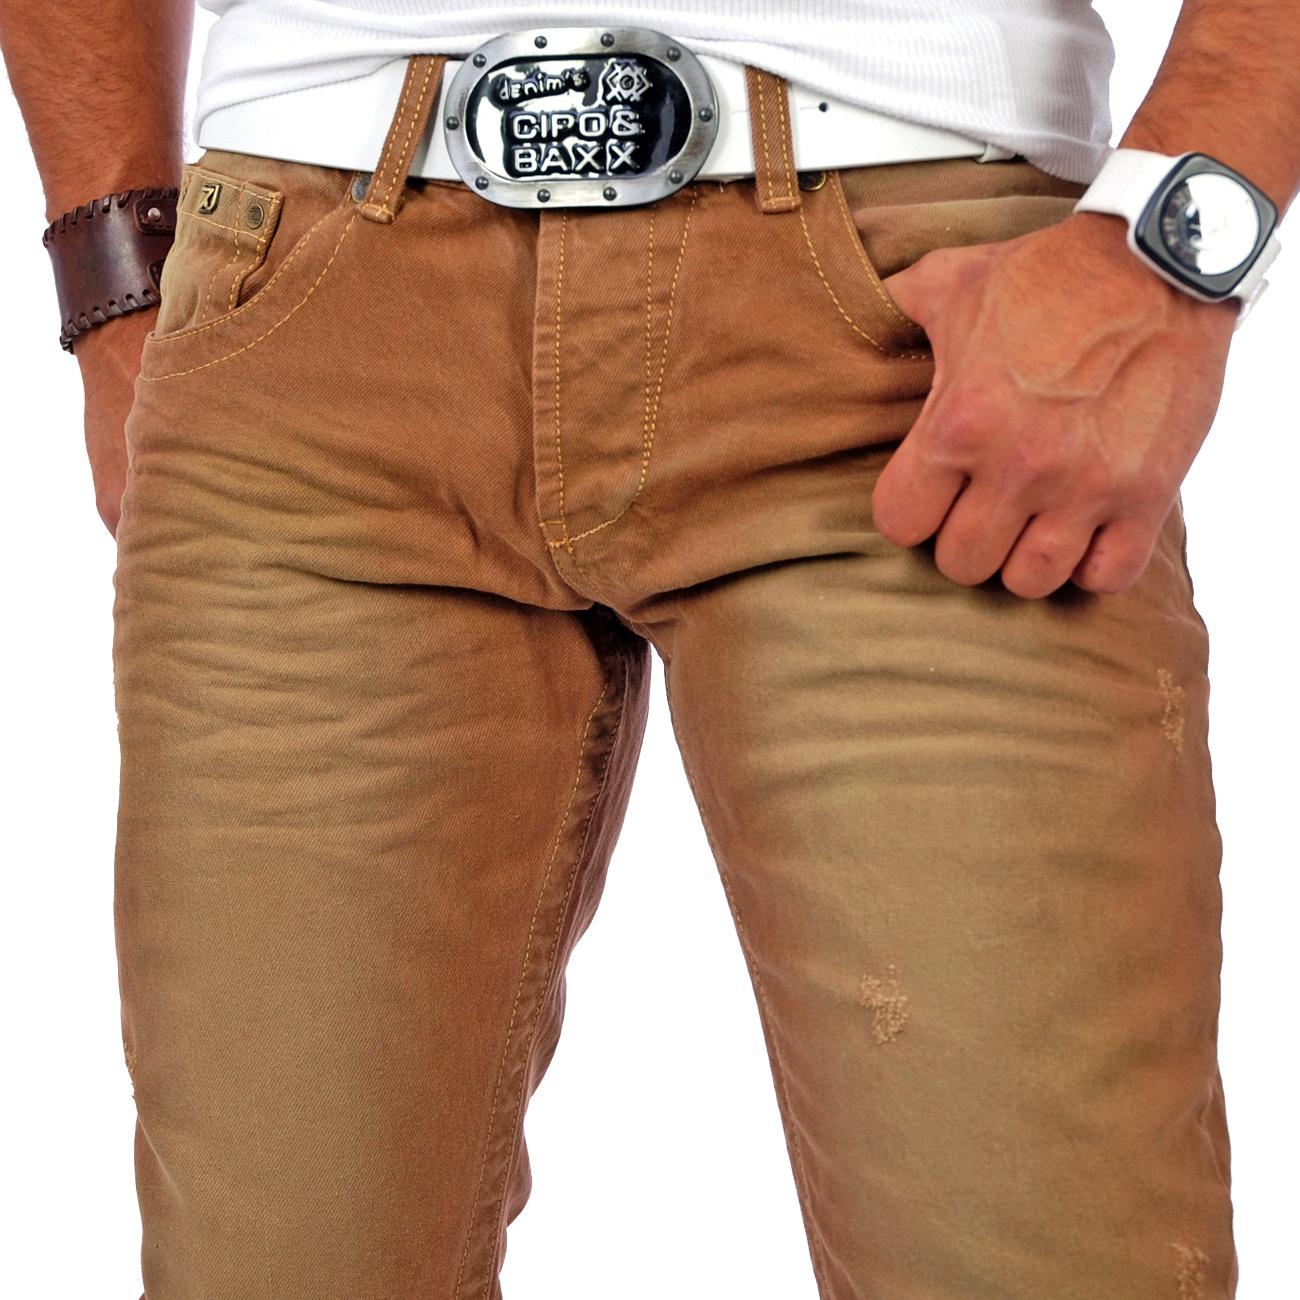 tazzio herren jeanshose jeans hose vintage style naht tz 5124 braun neu ebay. Black Bedroom Furniture Sets. Home Design Ideas